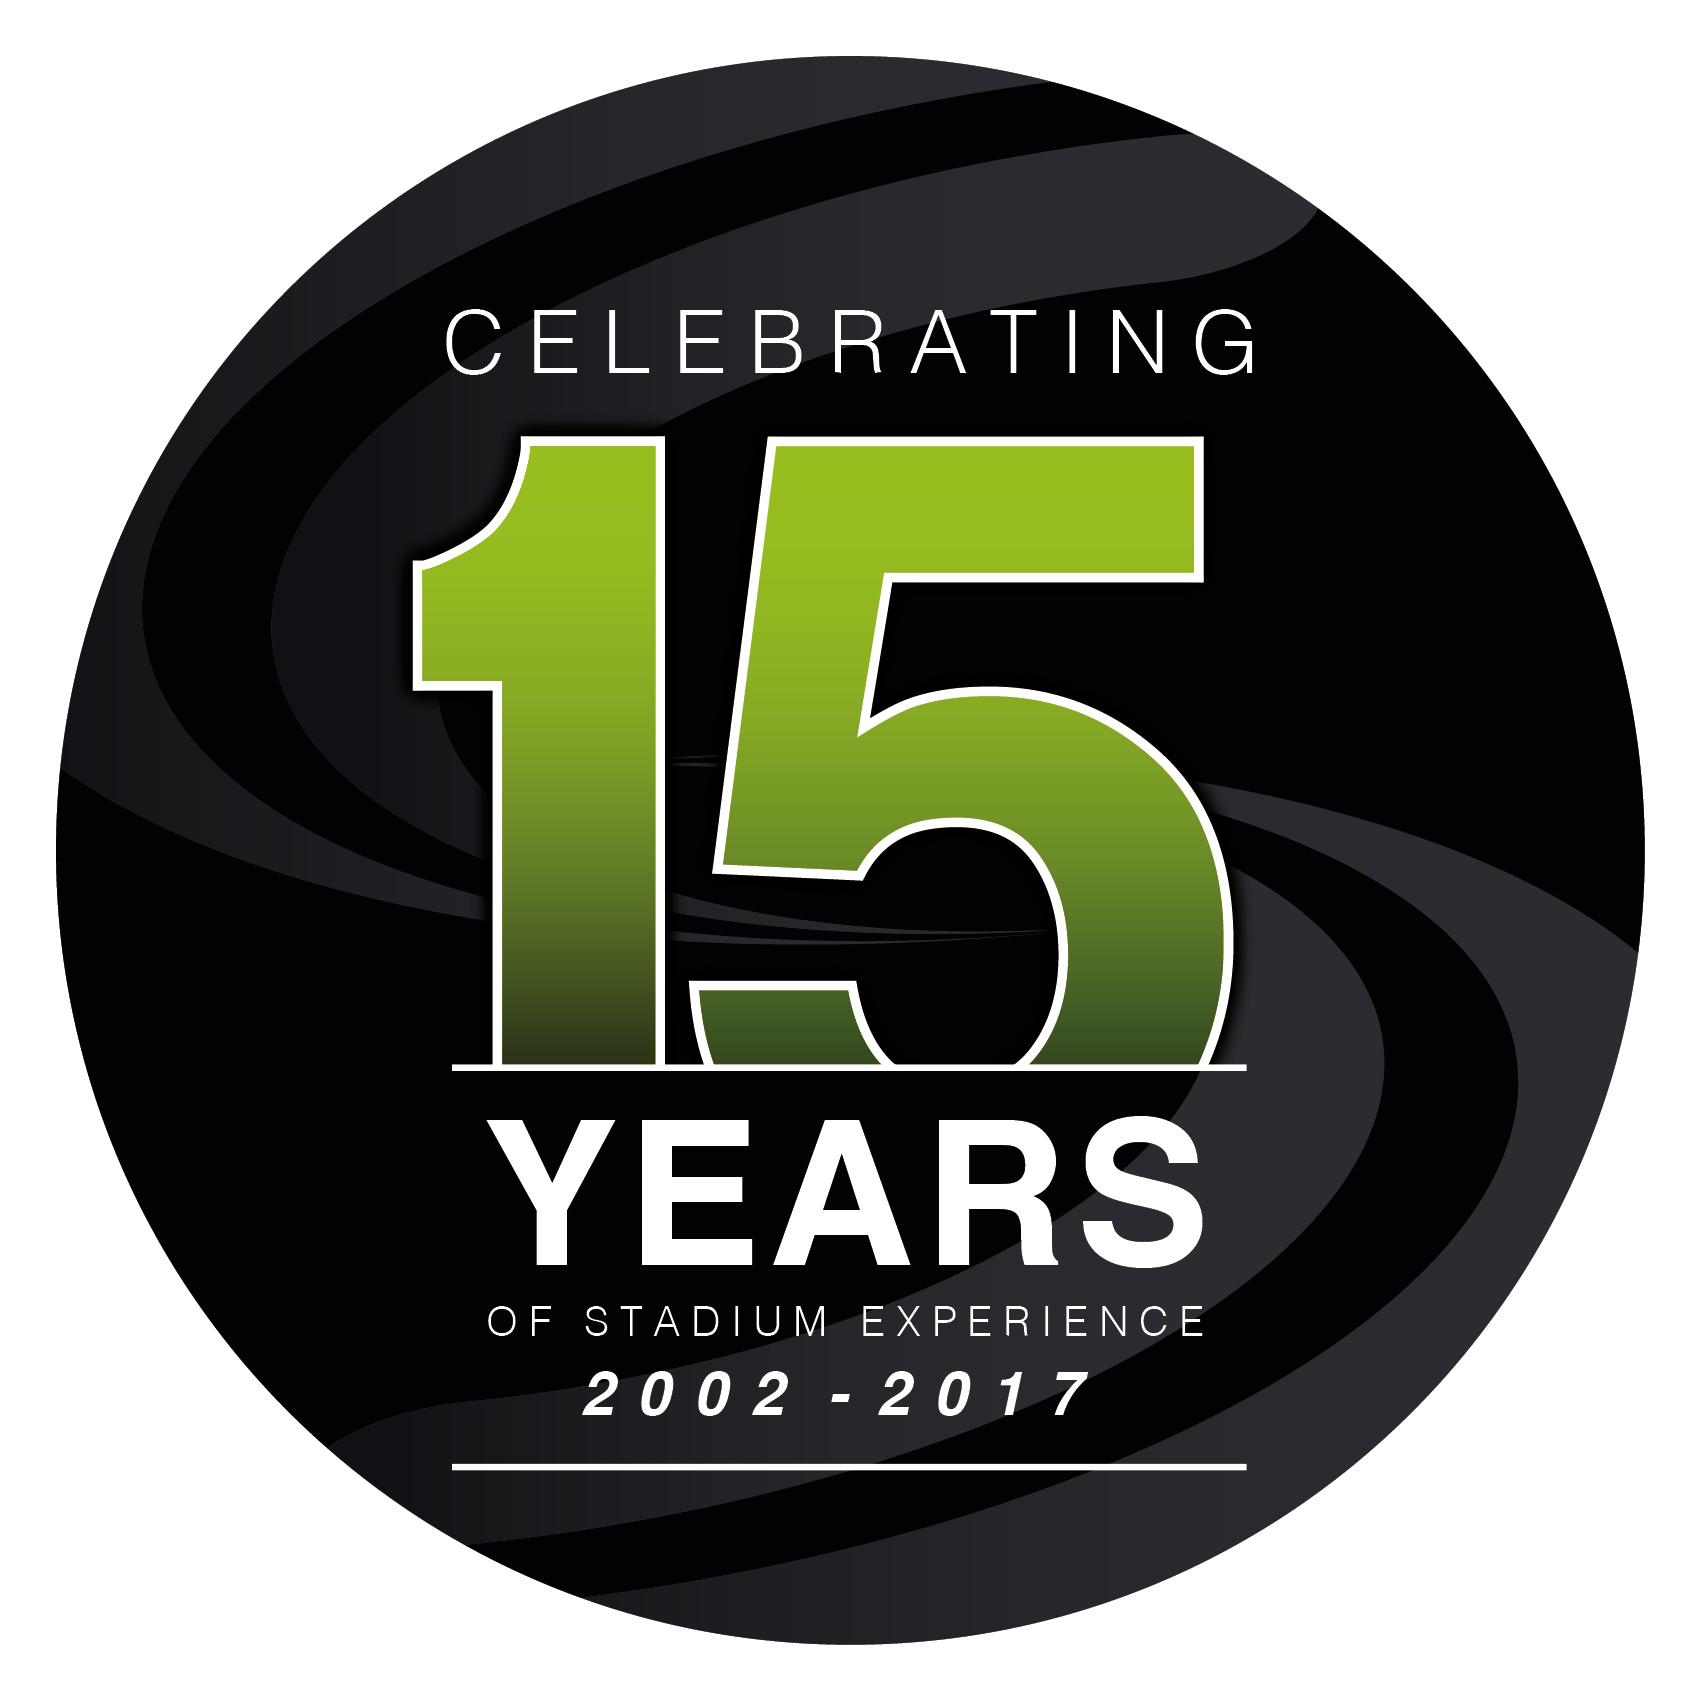 Stadium Experience 15th Anniversary Logo